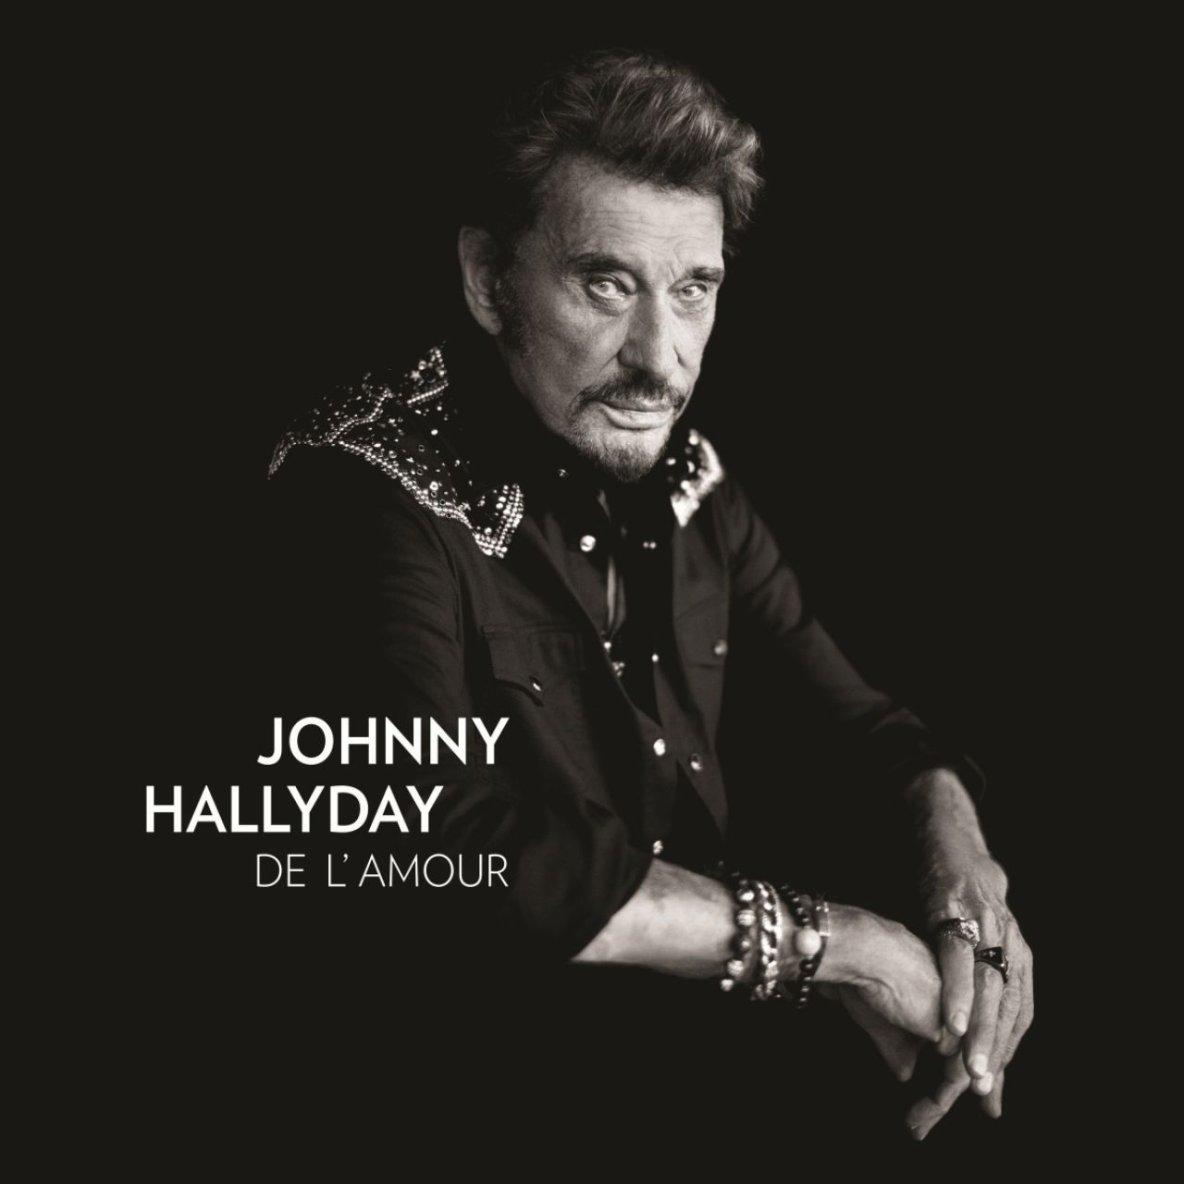 Johnny Hallyday annonce «De l'Amour», son 50e album studio